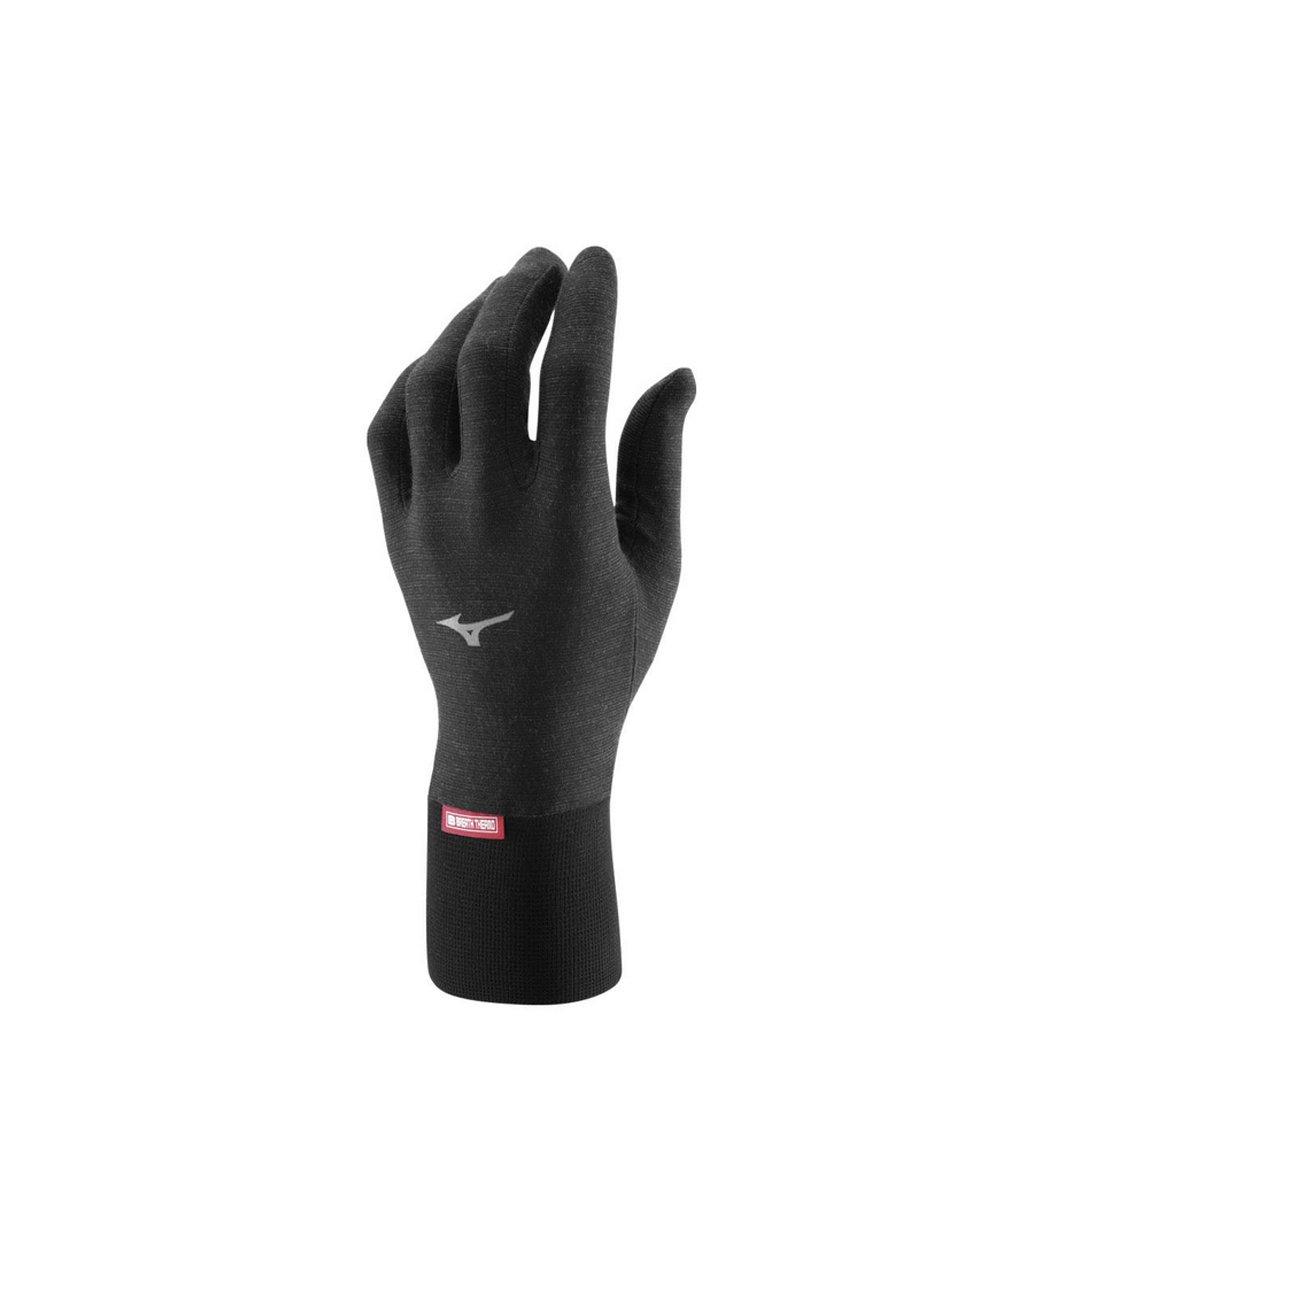 Mizuno Breath Thermo Light Weight Glove Black